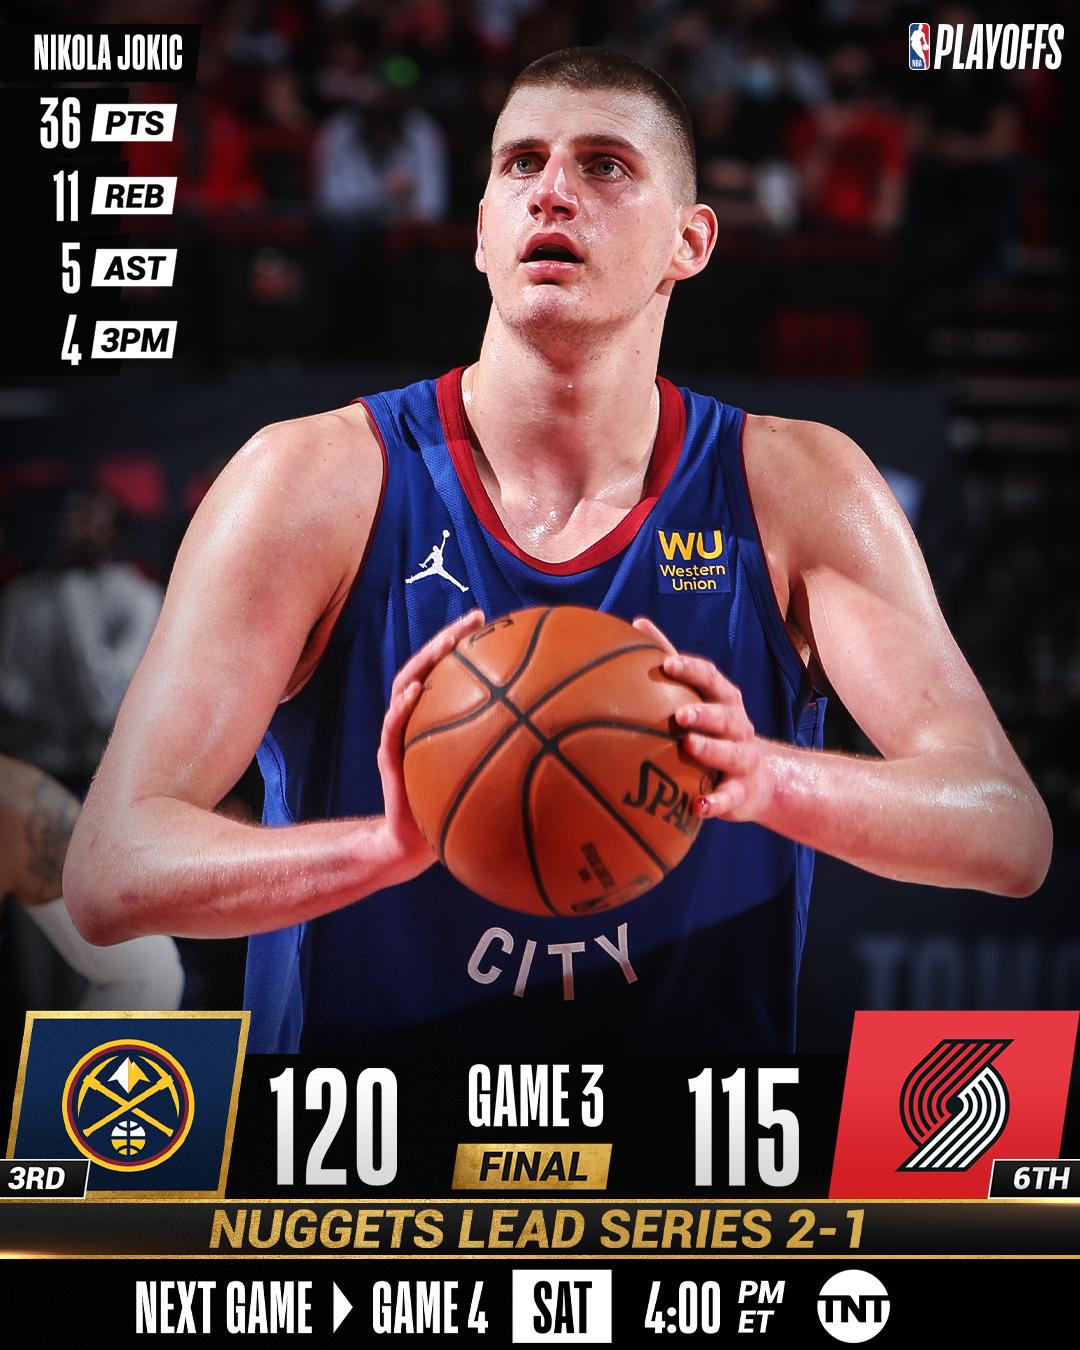 28-5-3